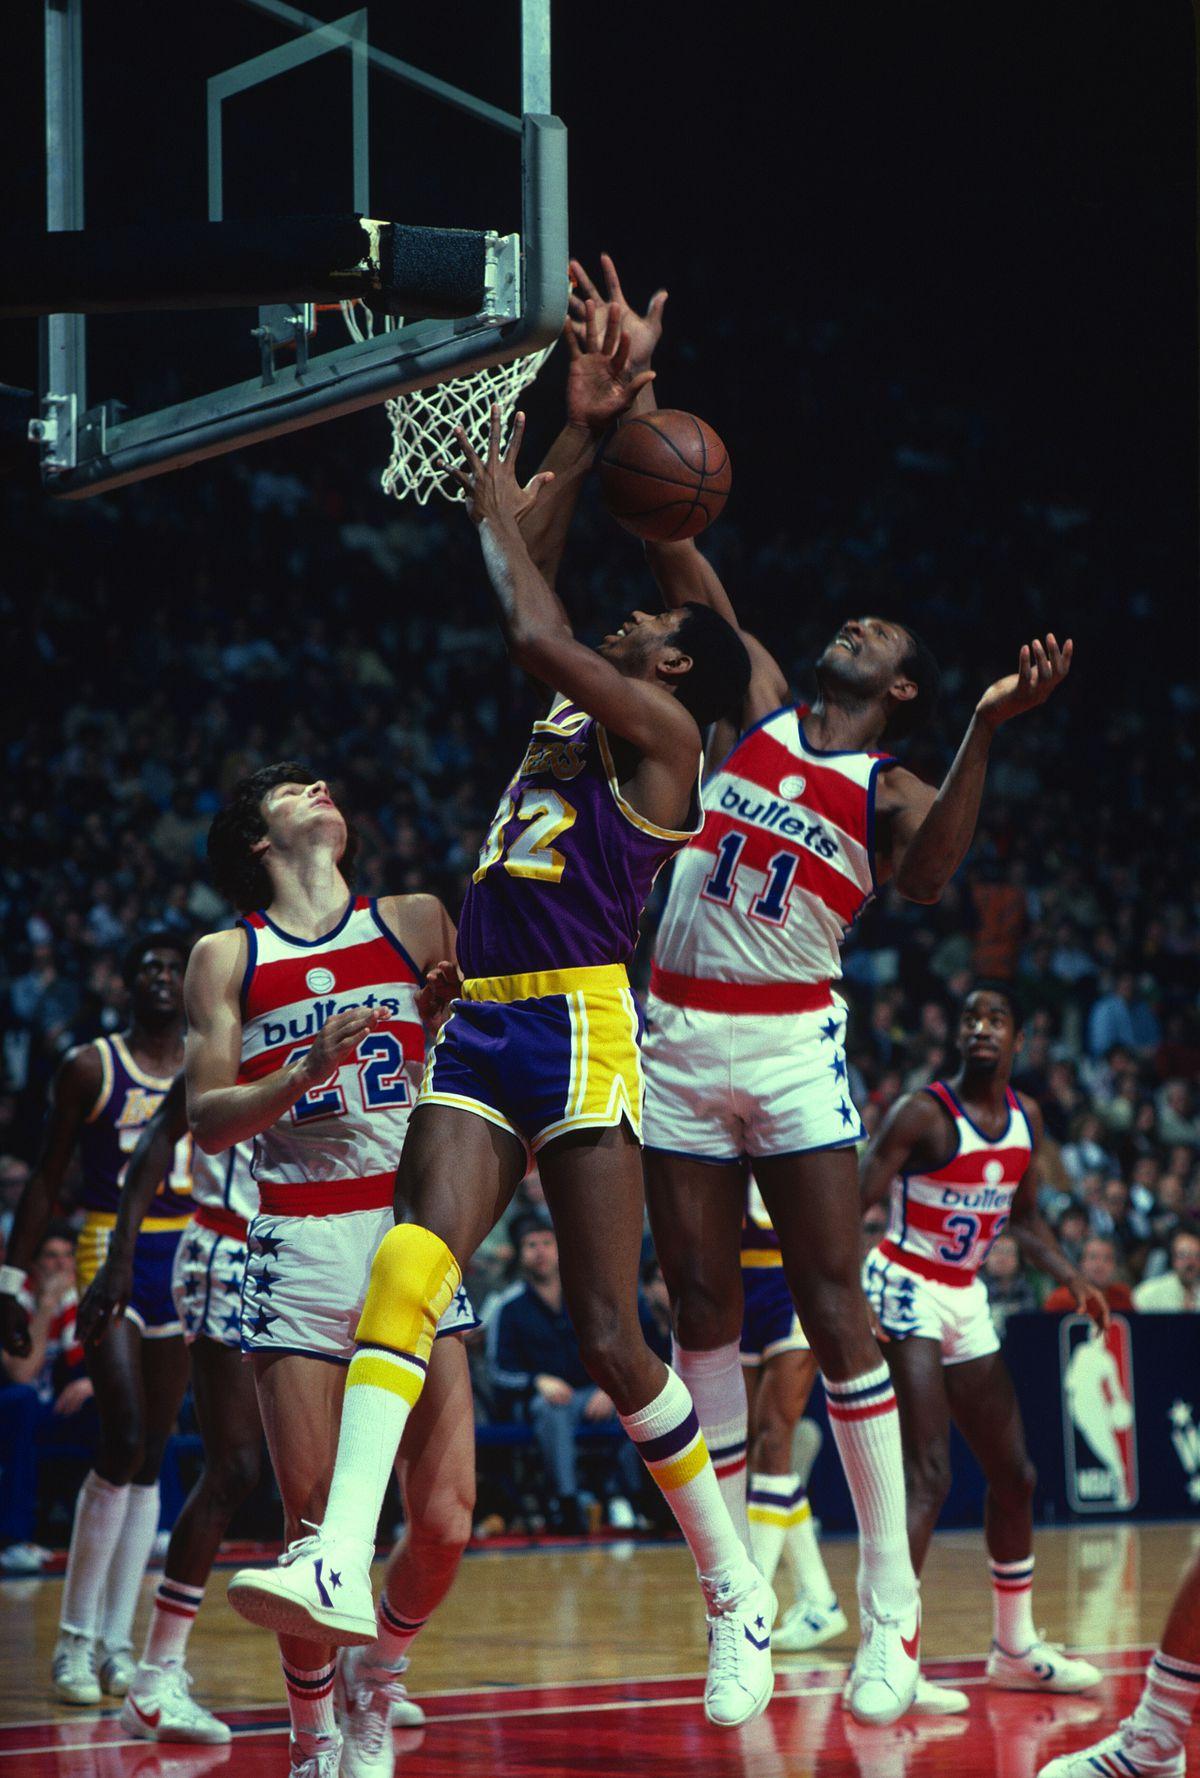 Los Angeles Lakers v Washington Bullets